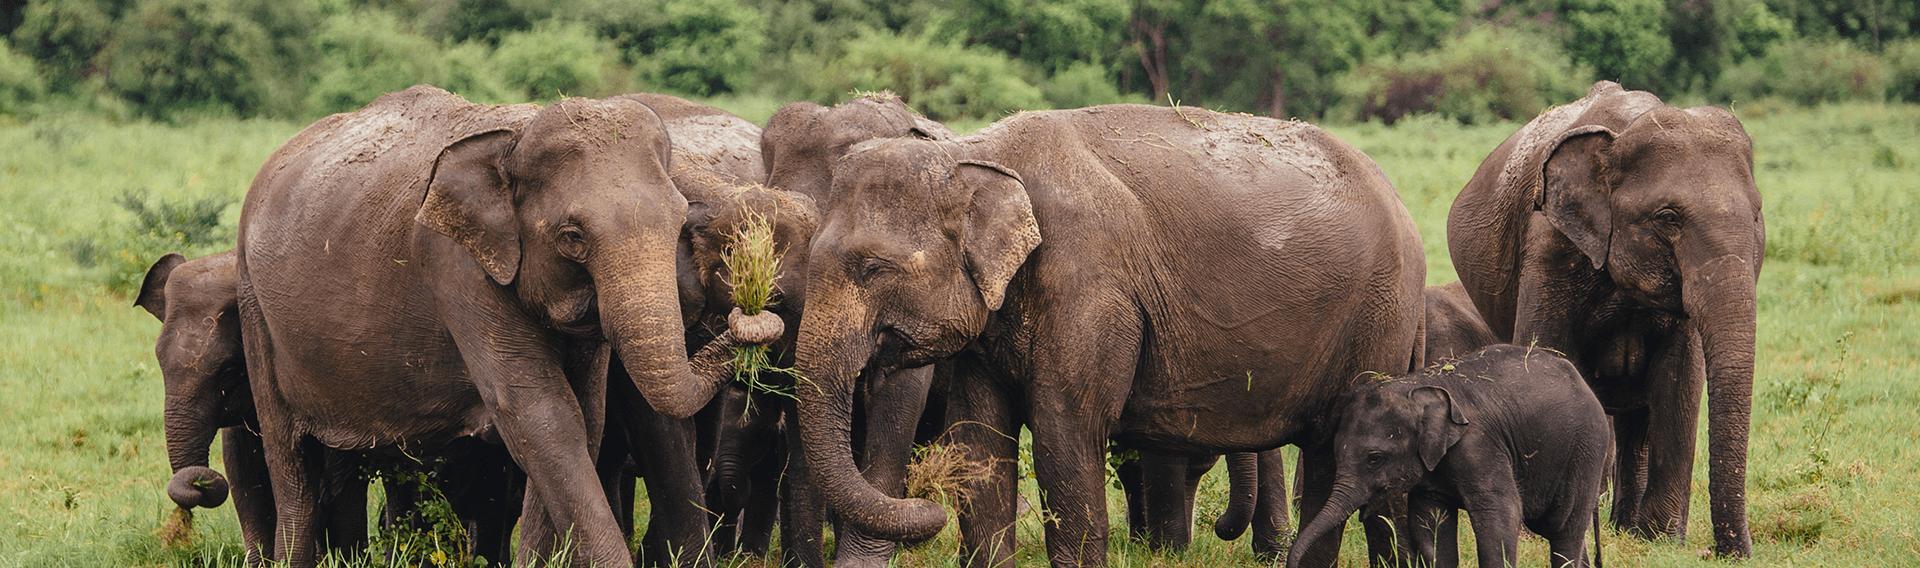 Sri Lanka, safari, elephants